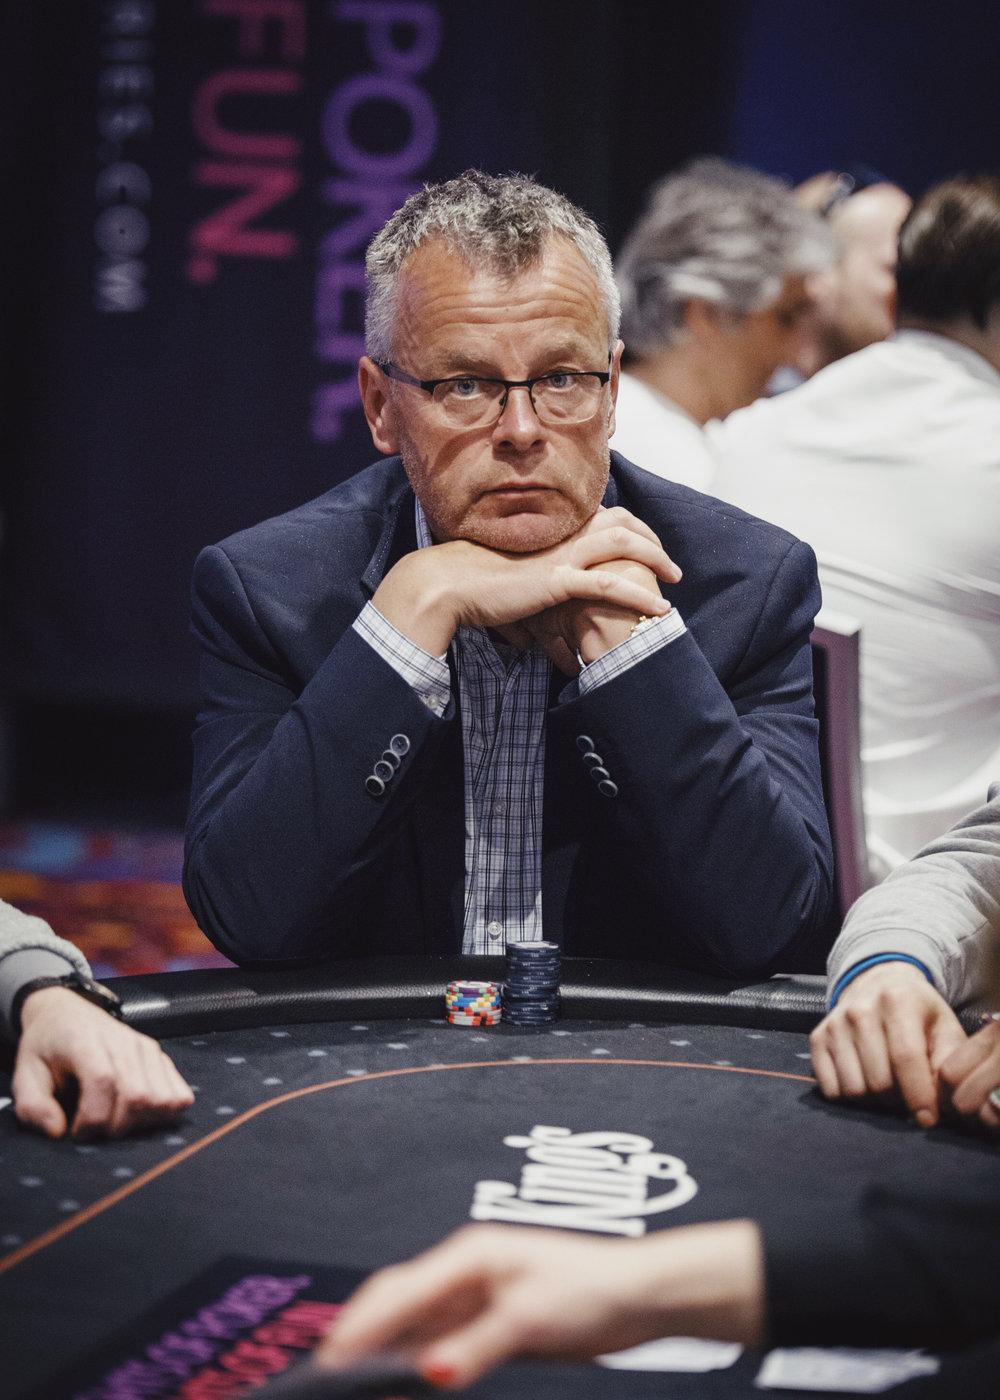 polina-shubkina-poker-041.JPG